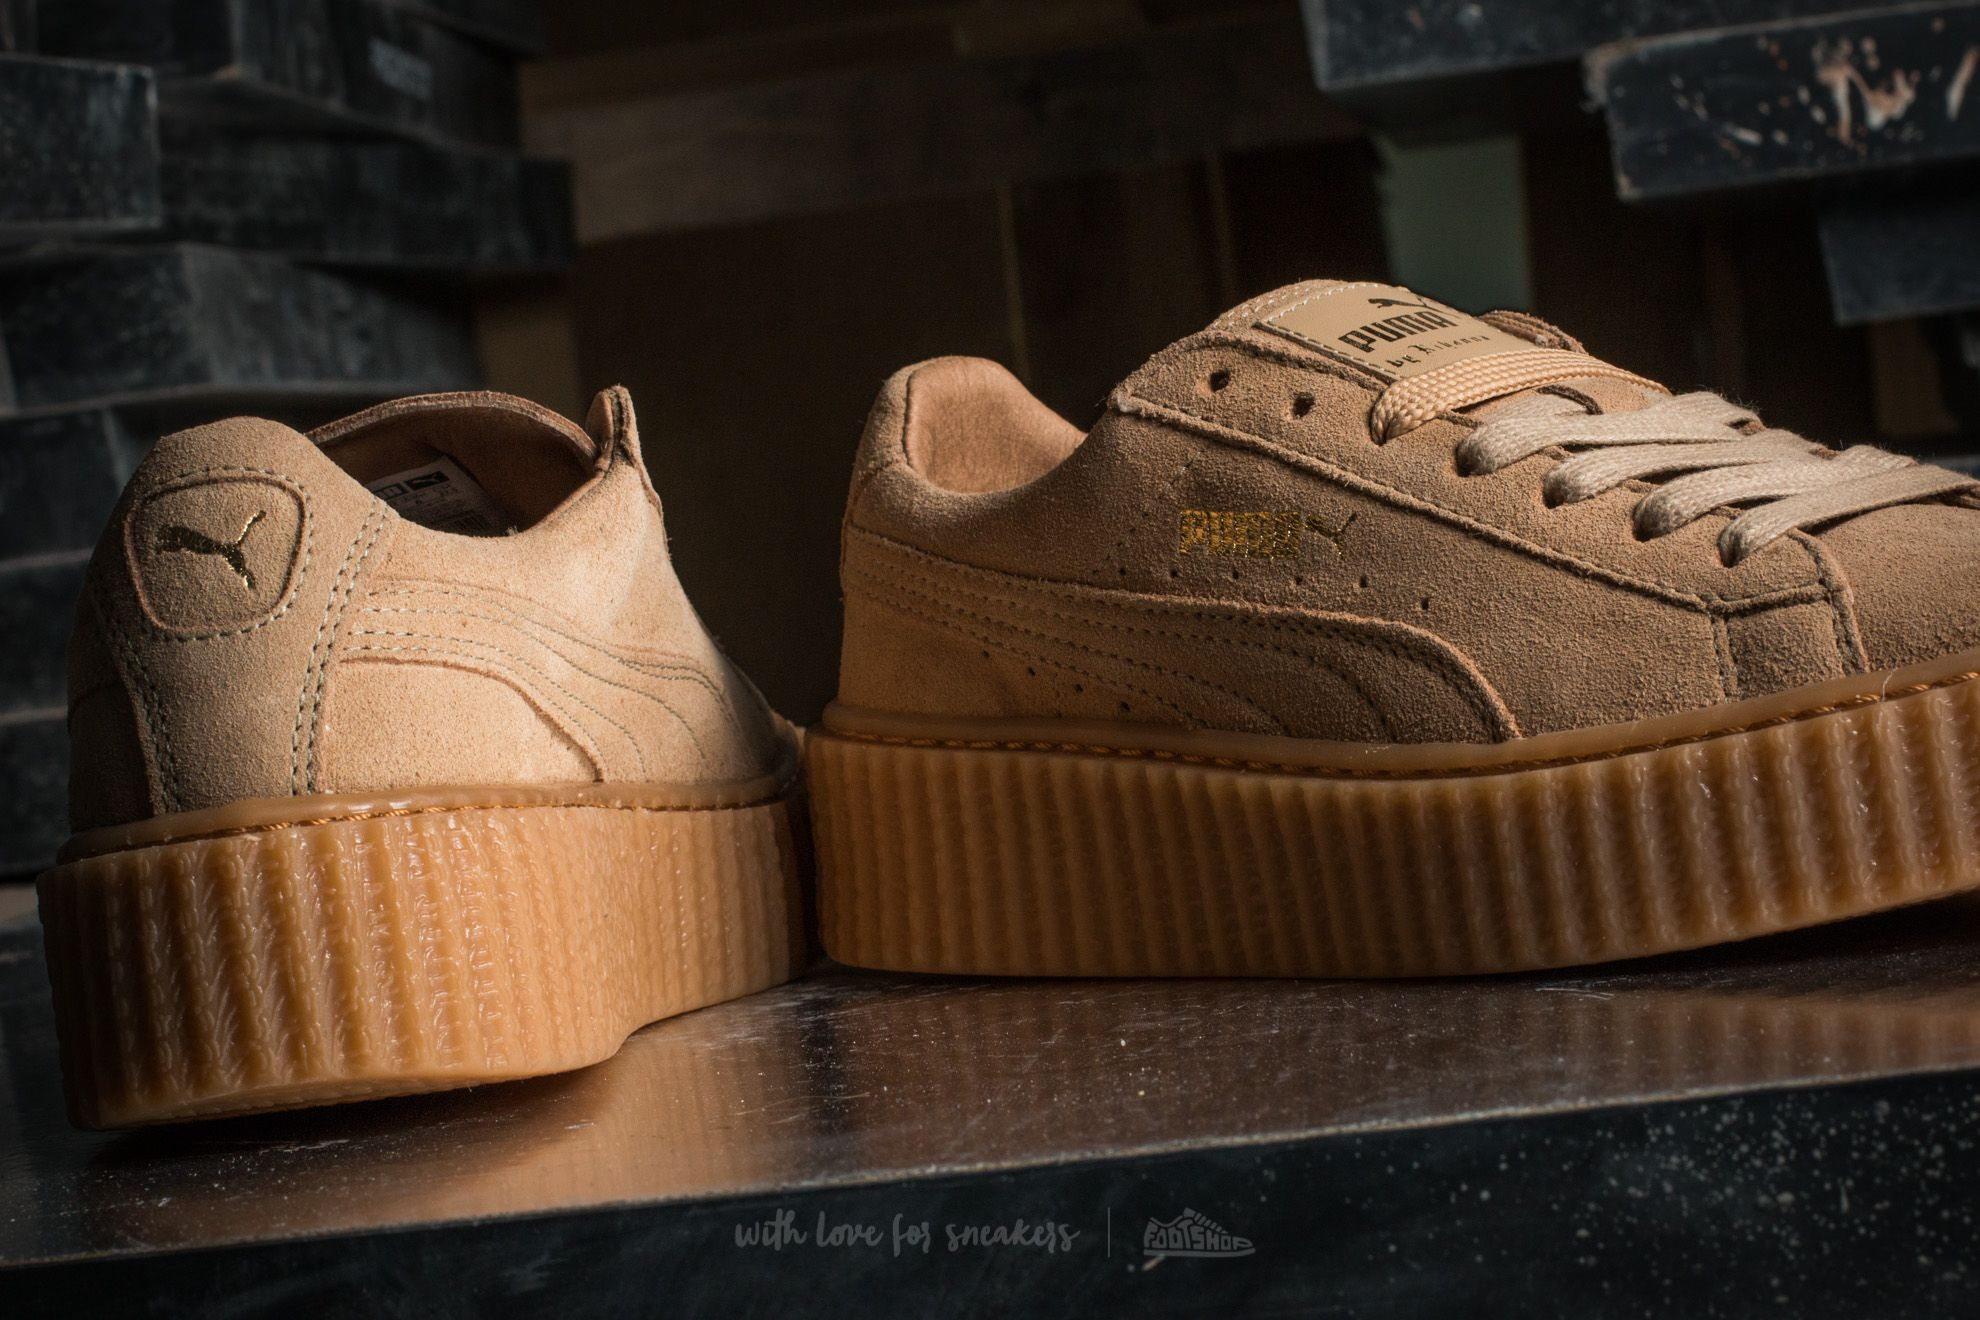 Suede Rihanna Creeper Sneaker Puma Oatmeal X 7 5 Beige